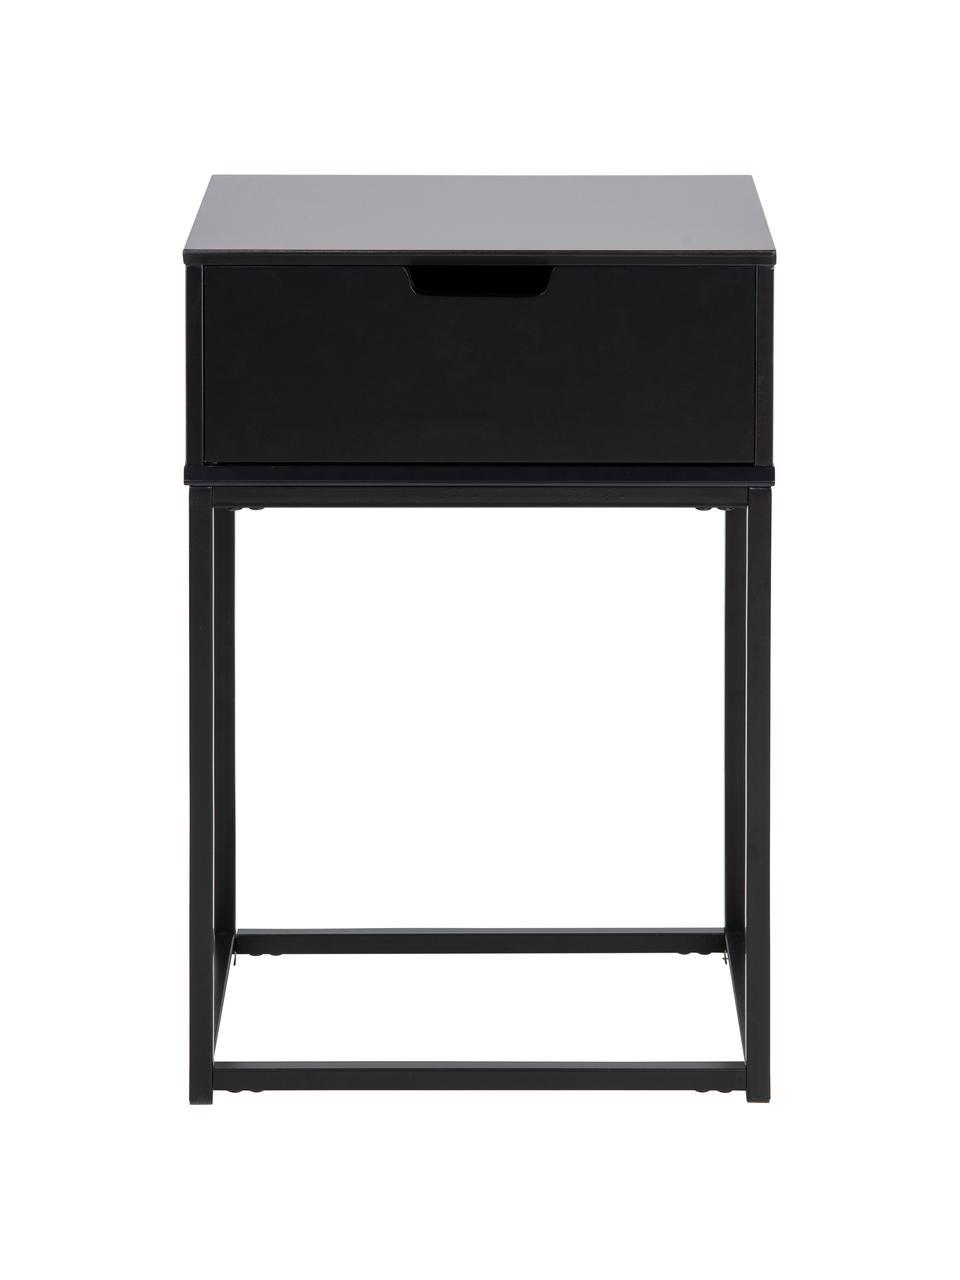 Table de chevet avec tiroir Mitra, Noir